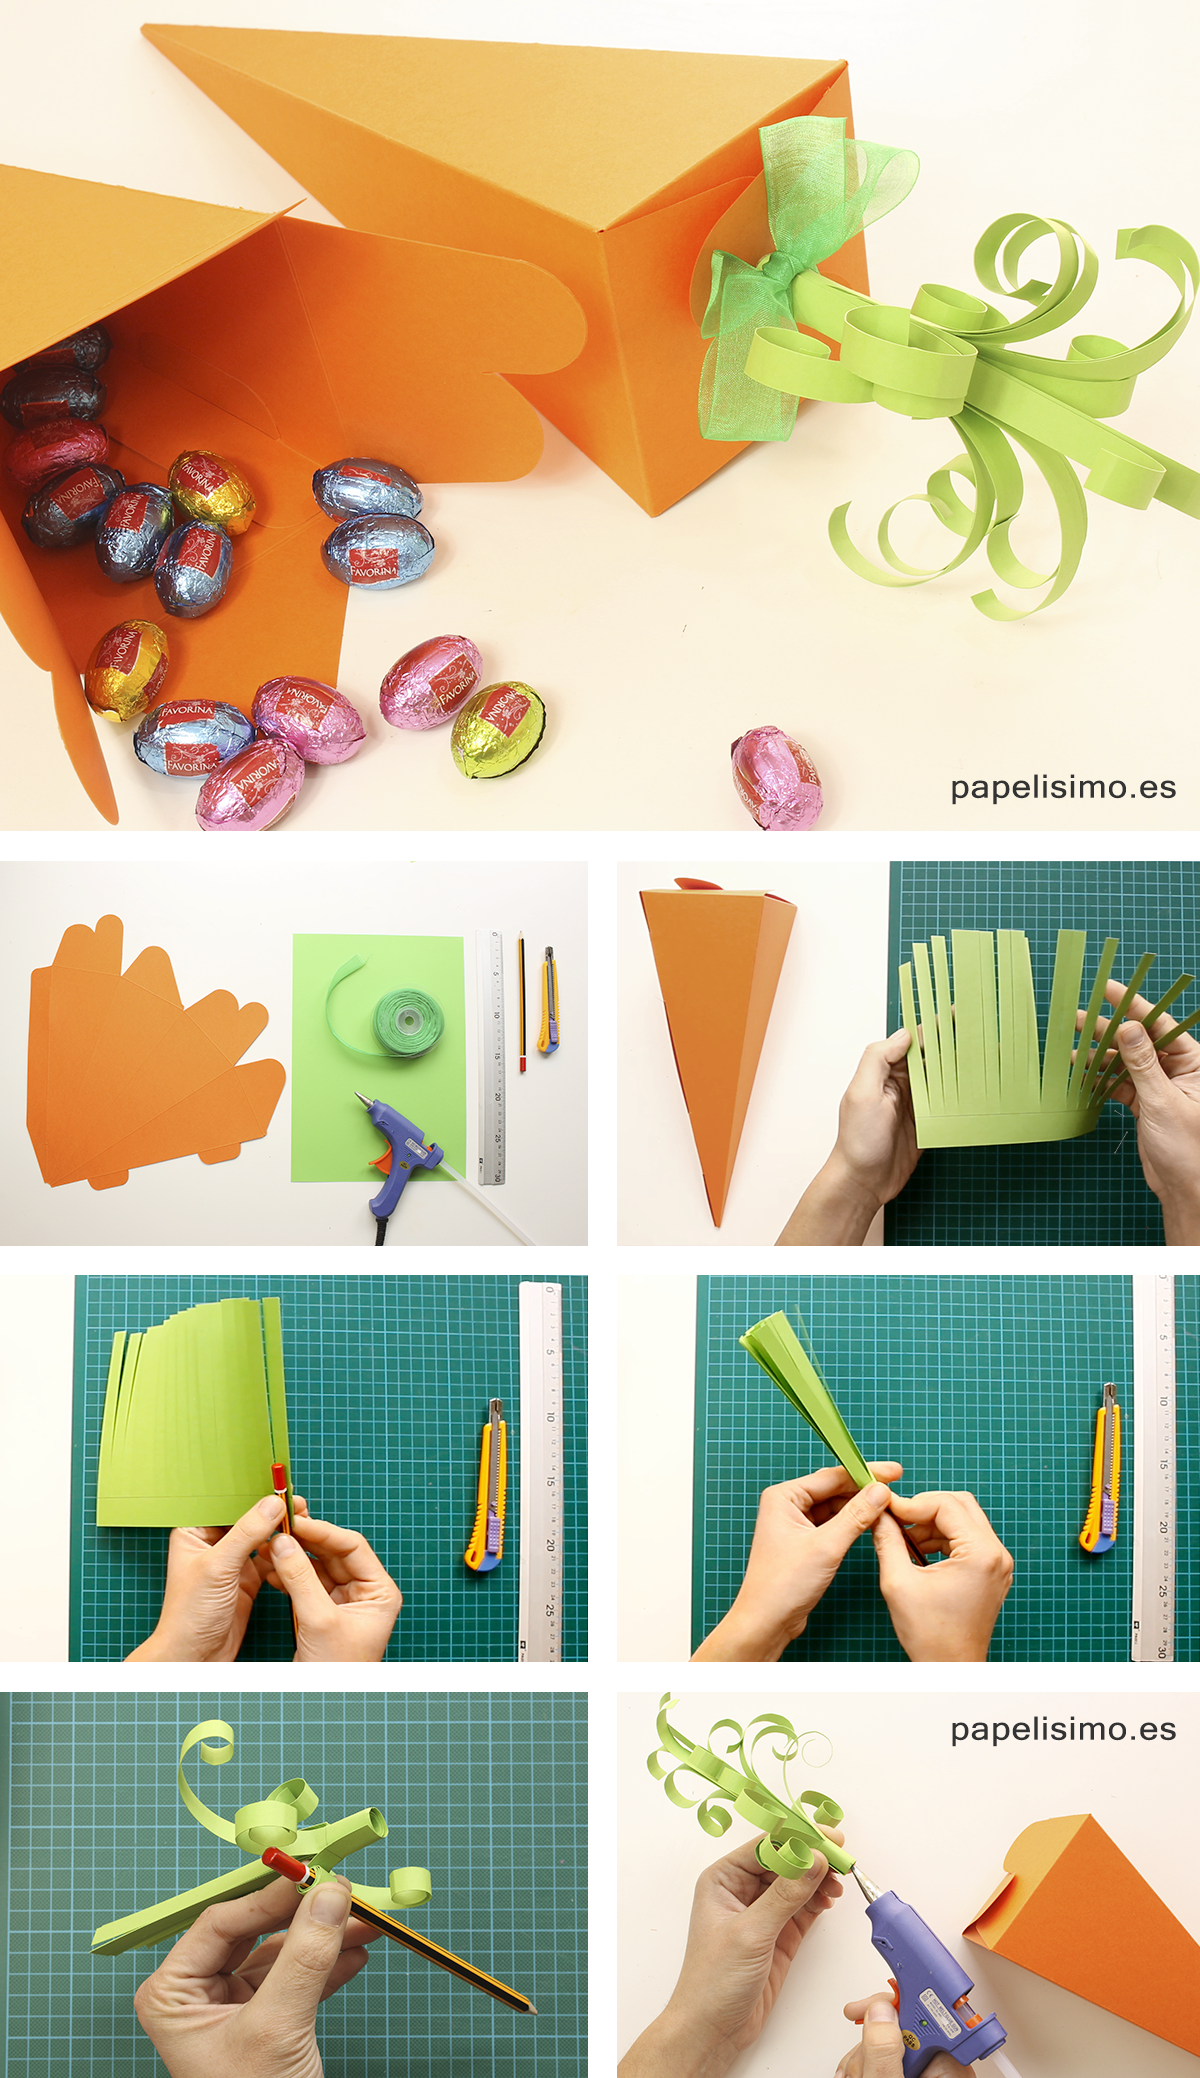 Cajas zanahoria cartulina Pascua DIY Paper carrots Easter